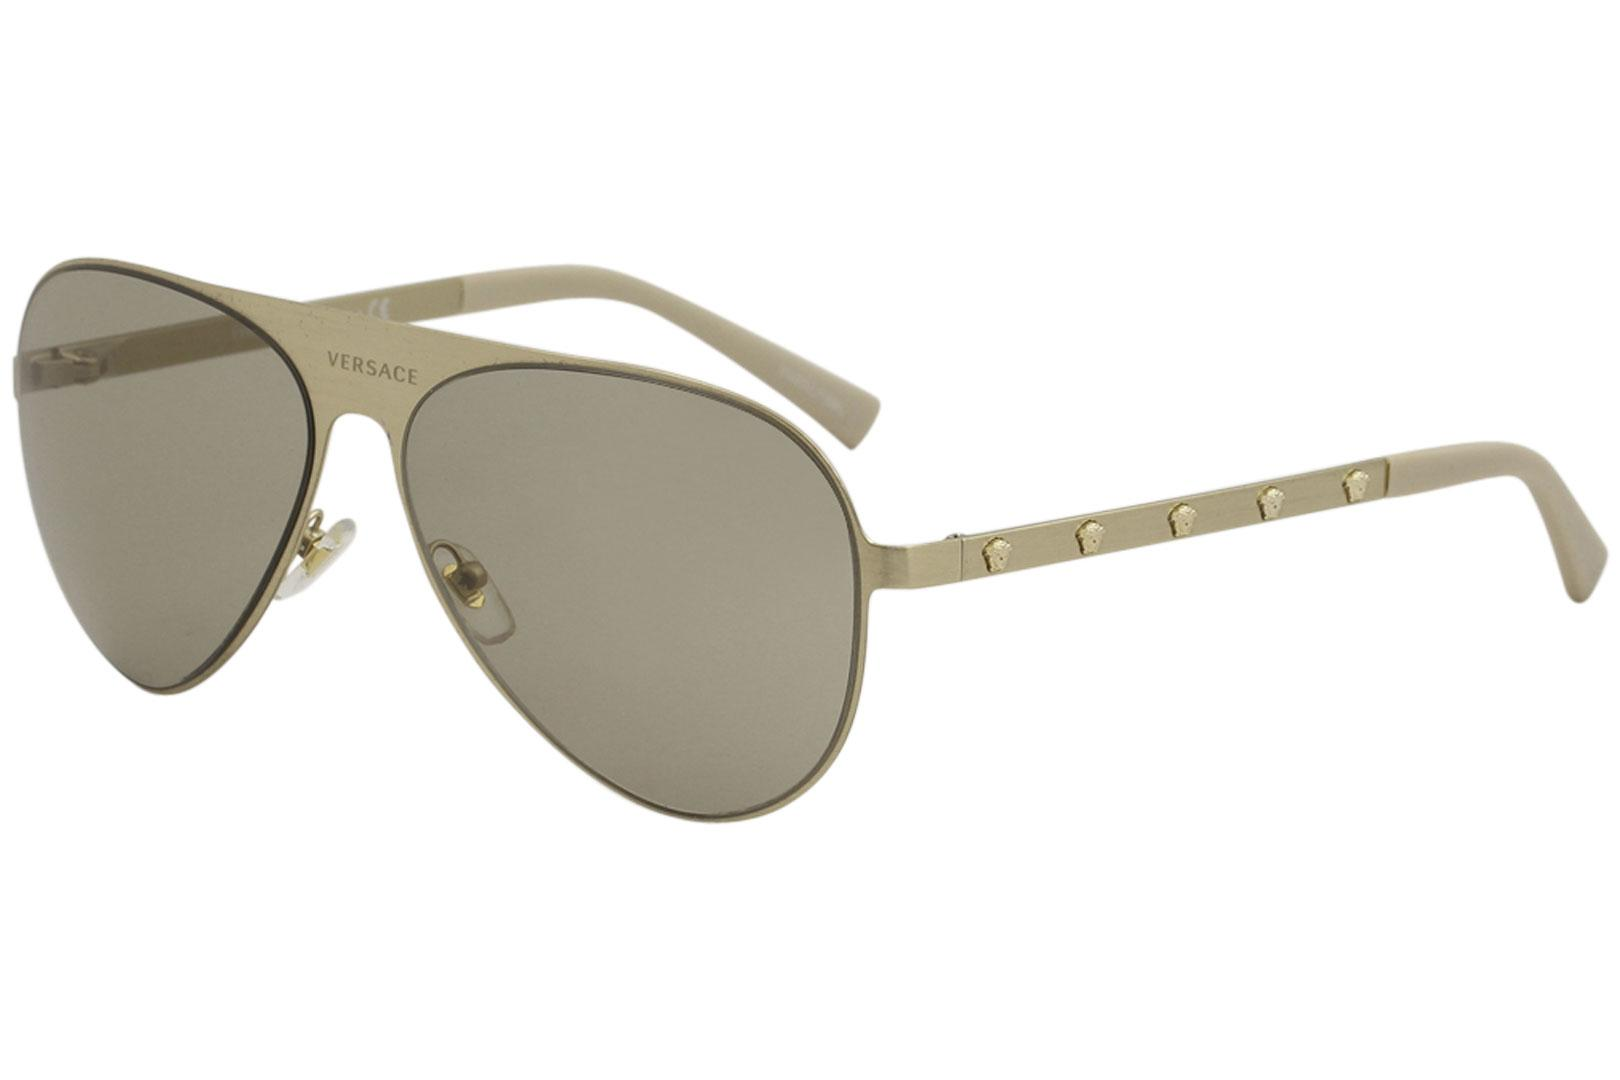 Versace VE2189 VE 2189 1339 3 Brushed Pale Gold Fashion Pilot ... da516c5252